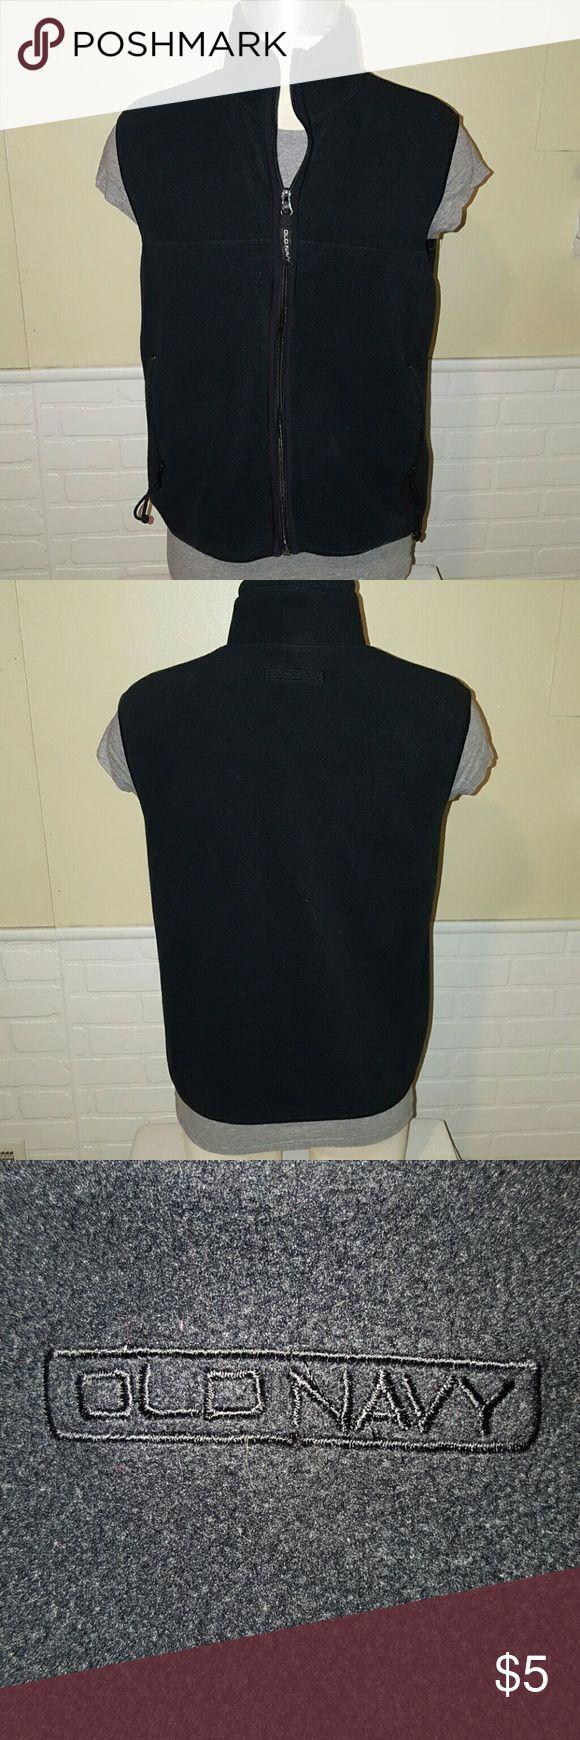 Old Navy vest Old Navy fleece vest. Good condition.  The vest has a mesh lining inside (last picture). Old Navy Jackets & Coats Vests